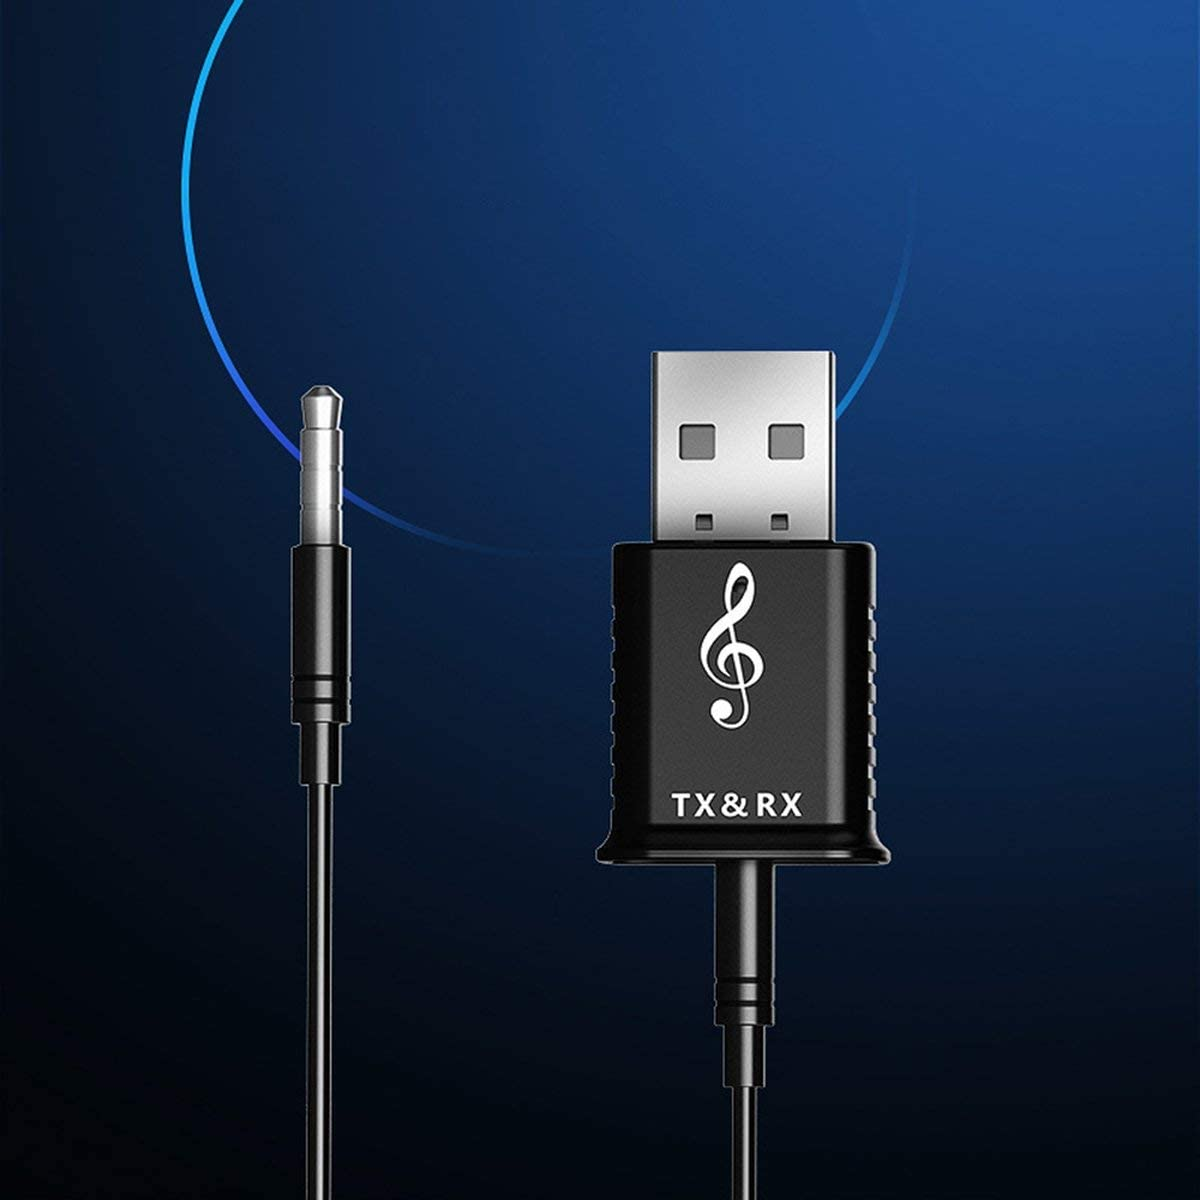 Greatangle 2 en 1 USB 5.0 Adaptador de dongle inal/ámbrico para PC Altavoz Rat/ón de la computadora Audio inal/ámbrico Transmisor de Receptor de m/úsica de Audio